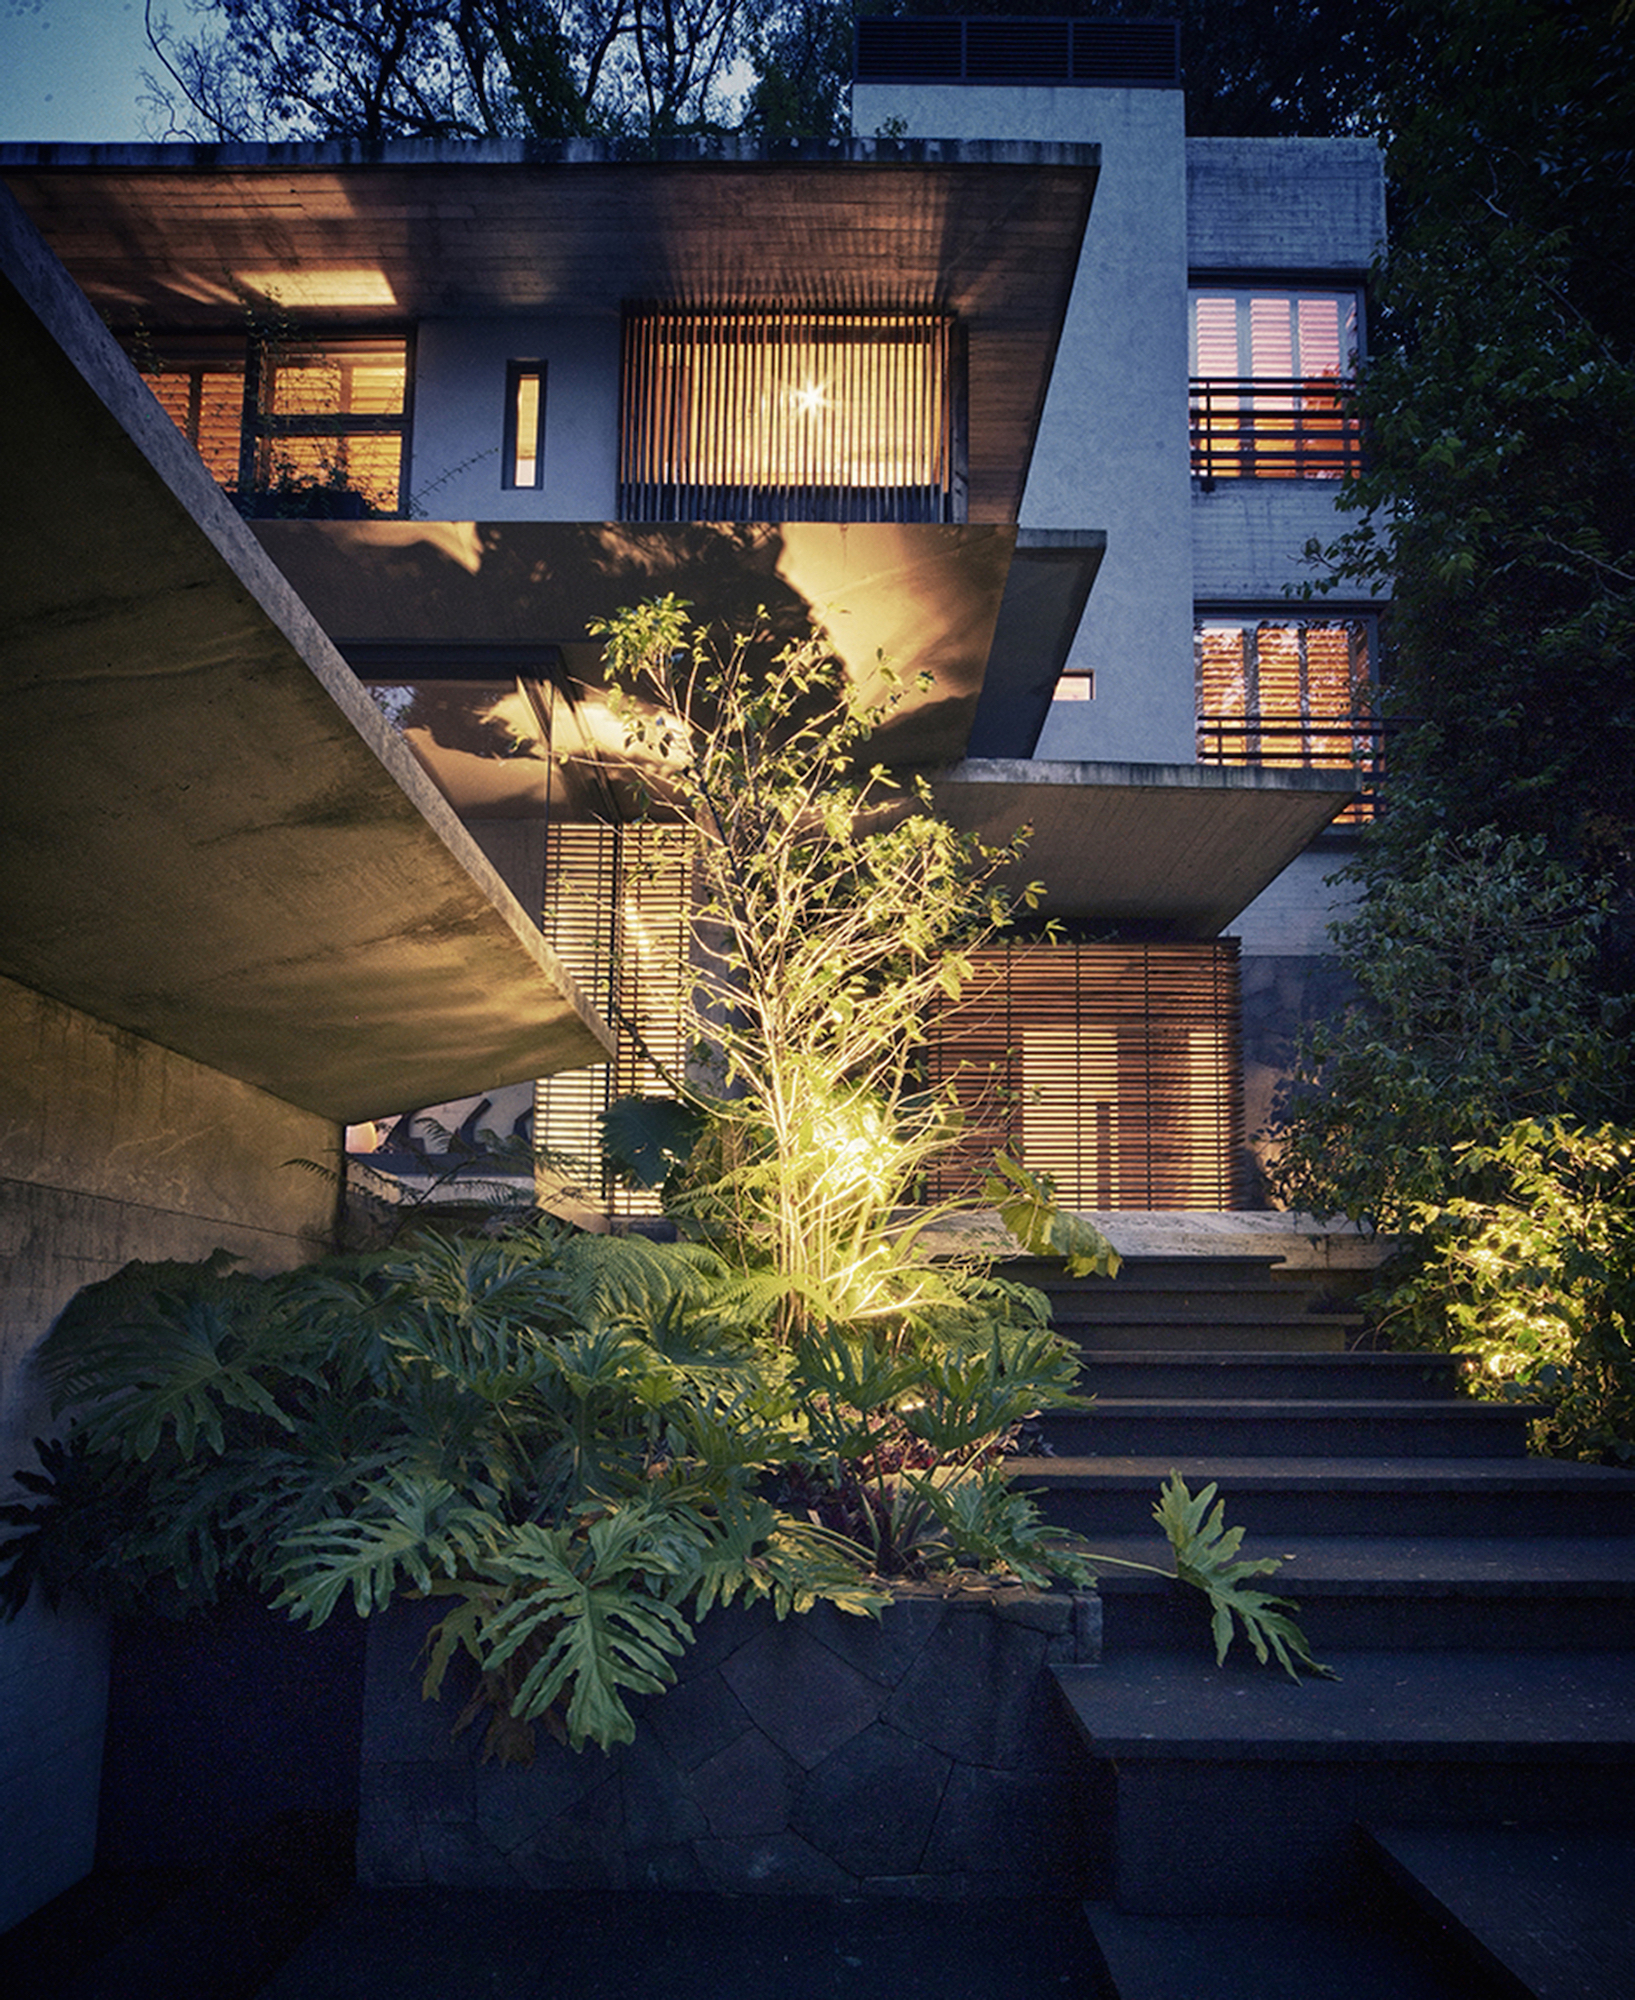 530eb848c07a80ce8b00011d_house-maza-chk-arquitectura_2014_02_18_mz_fotos_yoshihiro_2280px_ancho_-23-